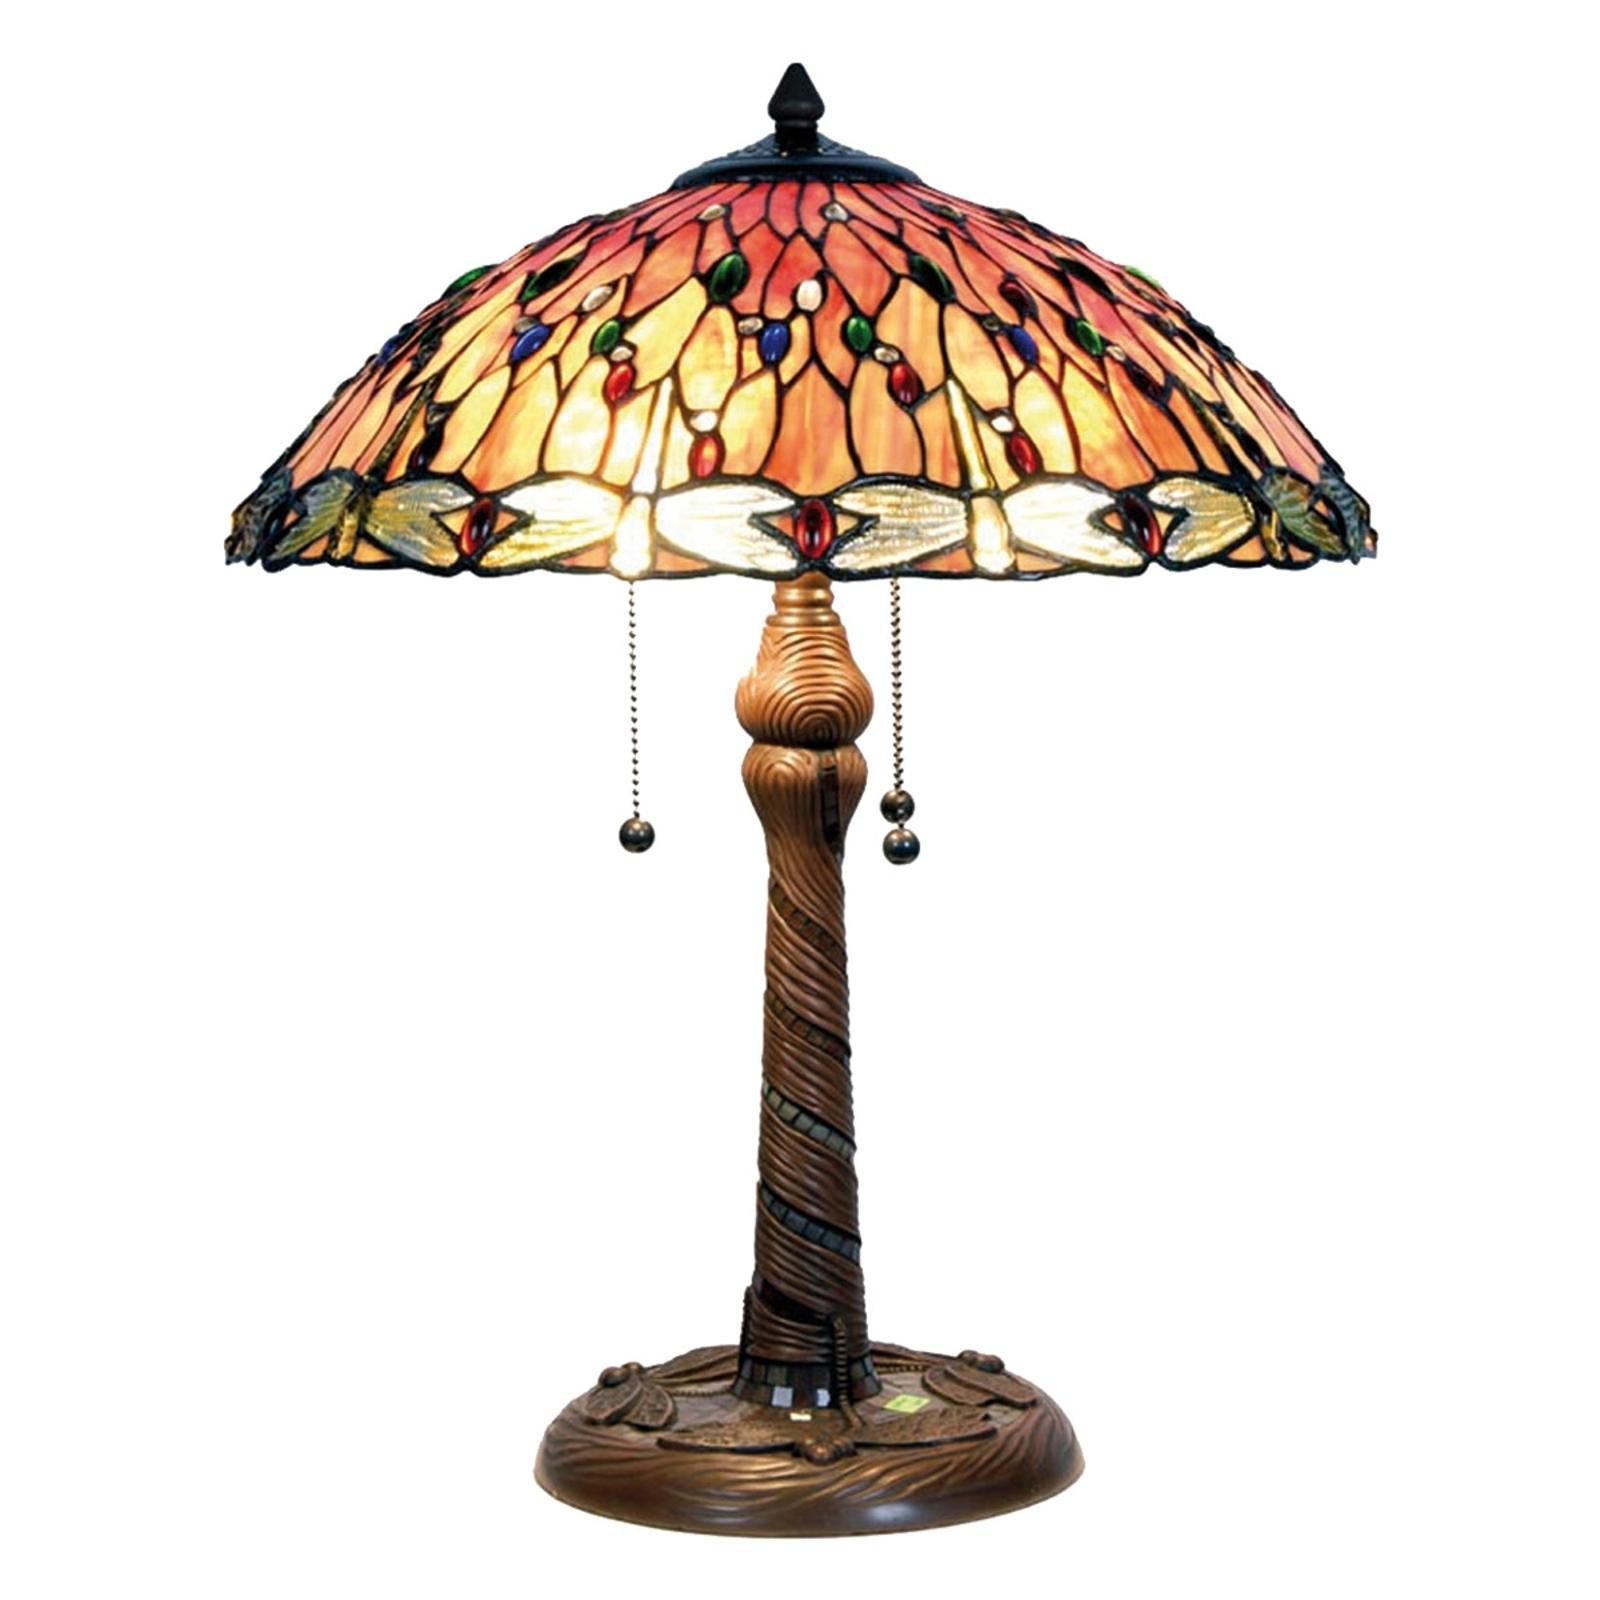 Sprookjesachtige tafellamp Bella in Tiffany-stijl